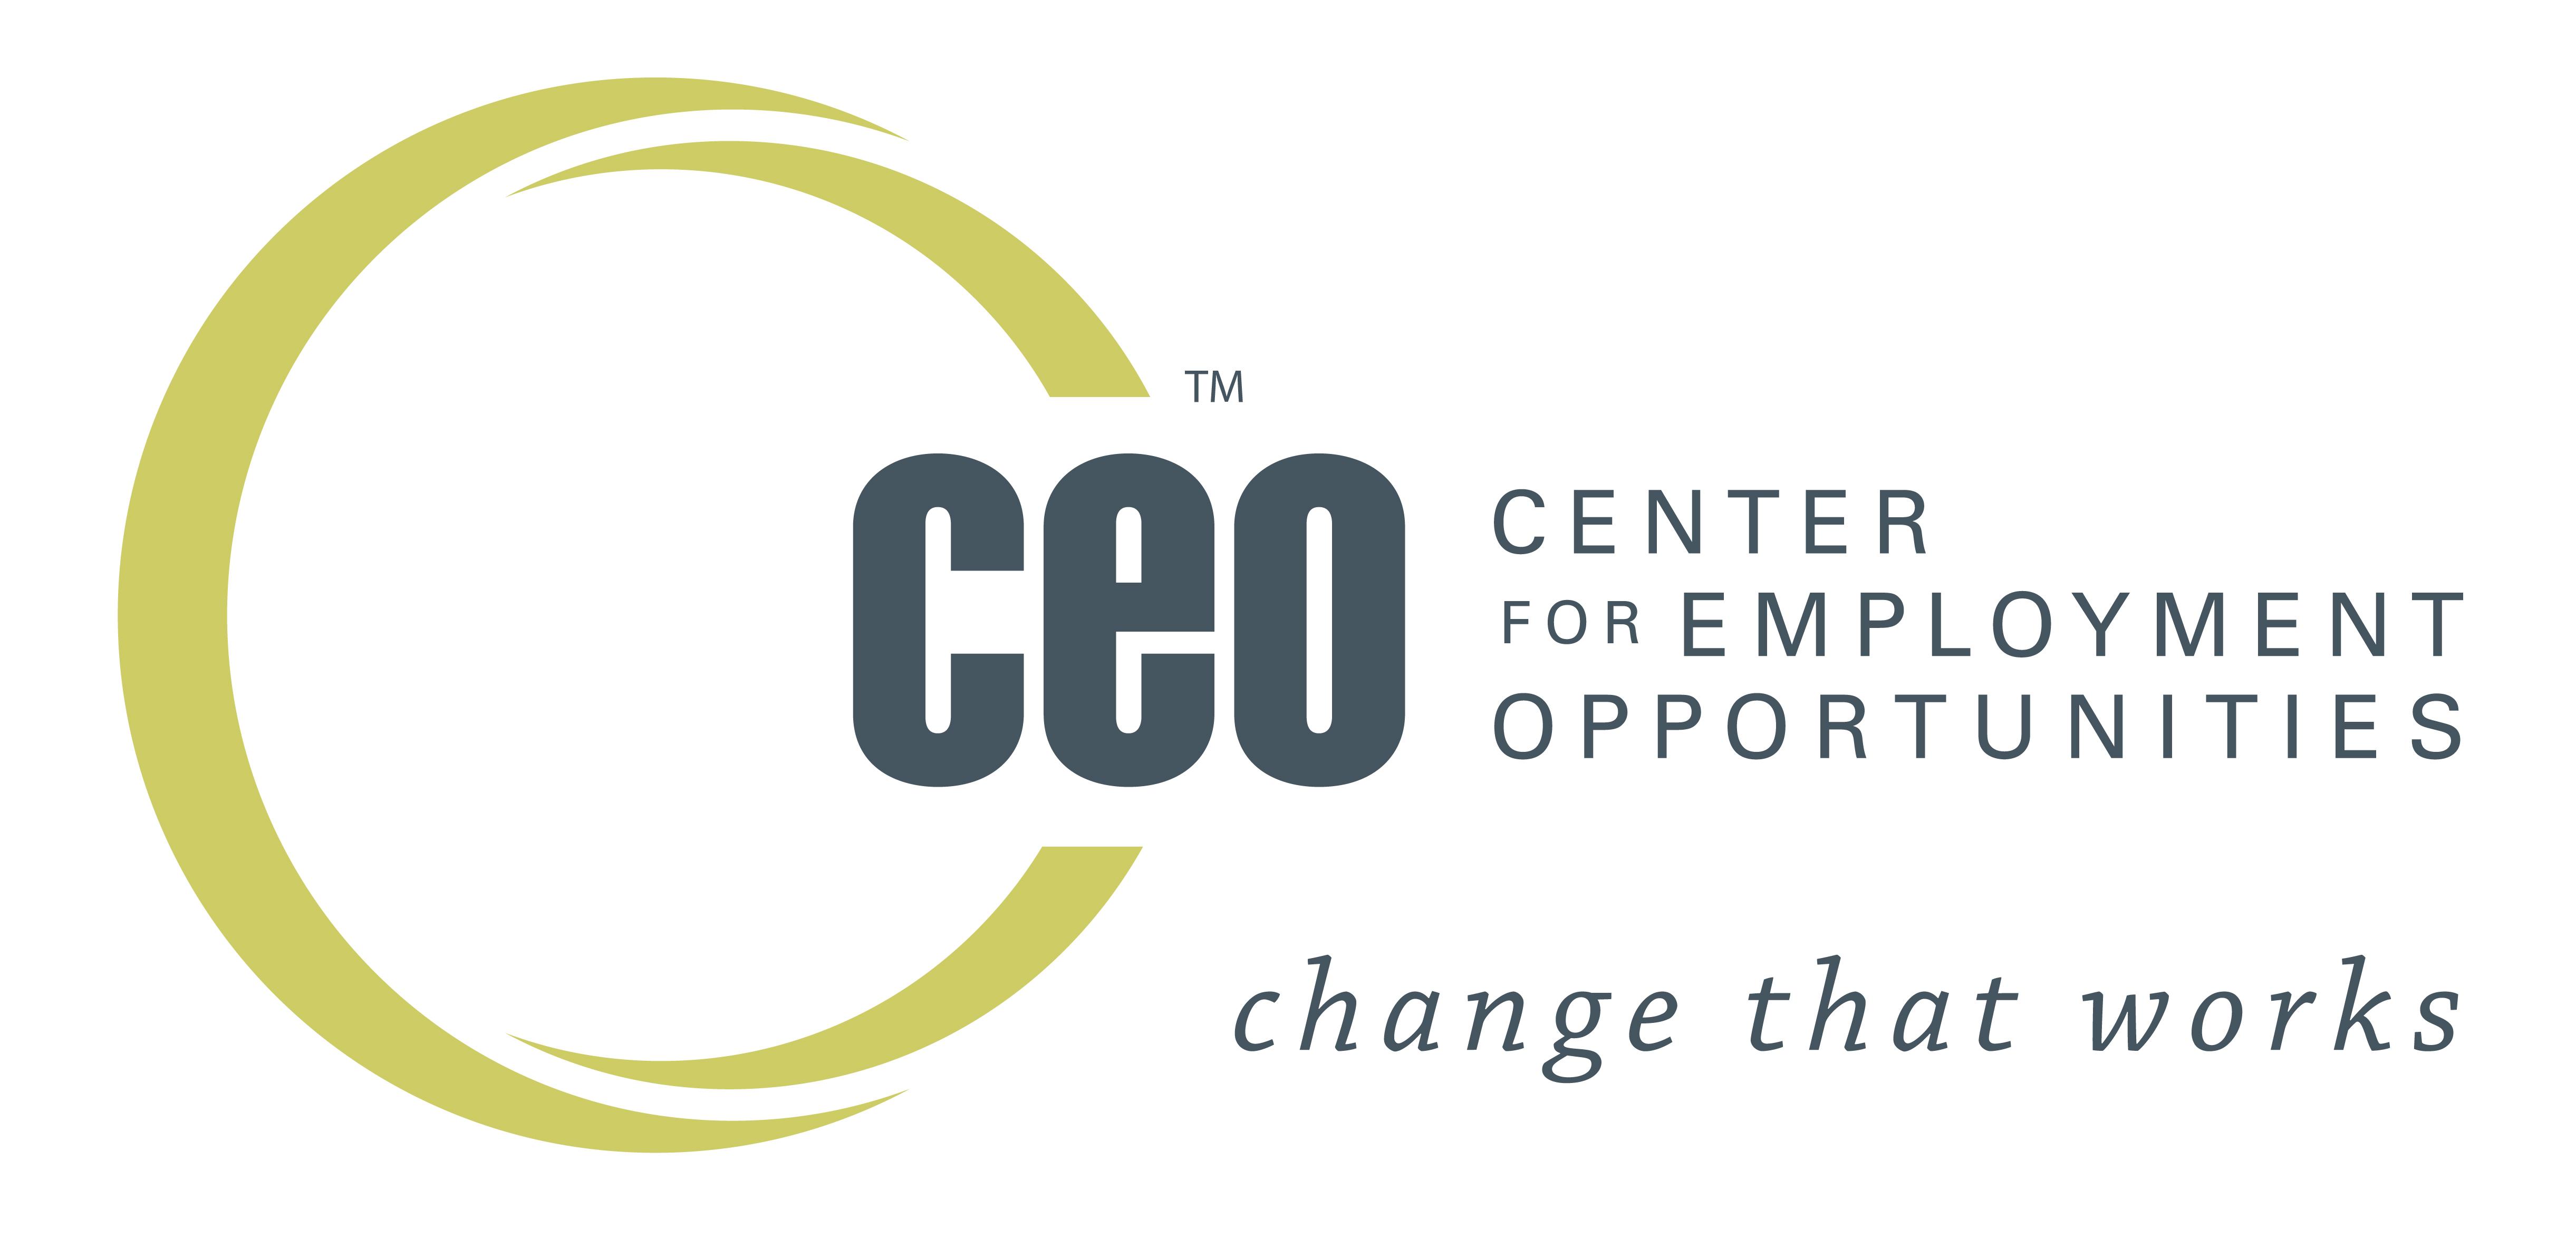 Center for Employment Opportunities